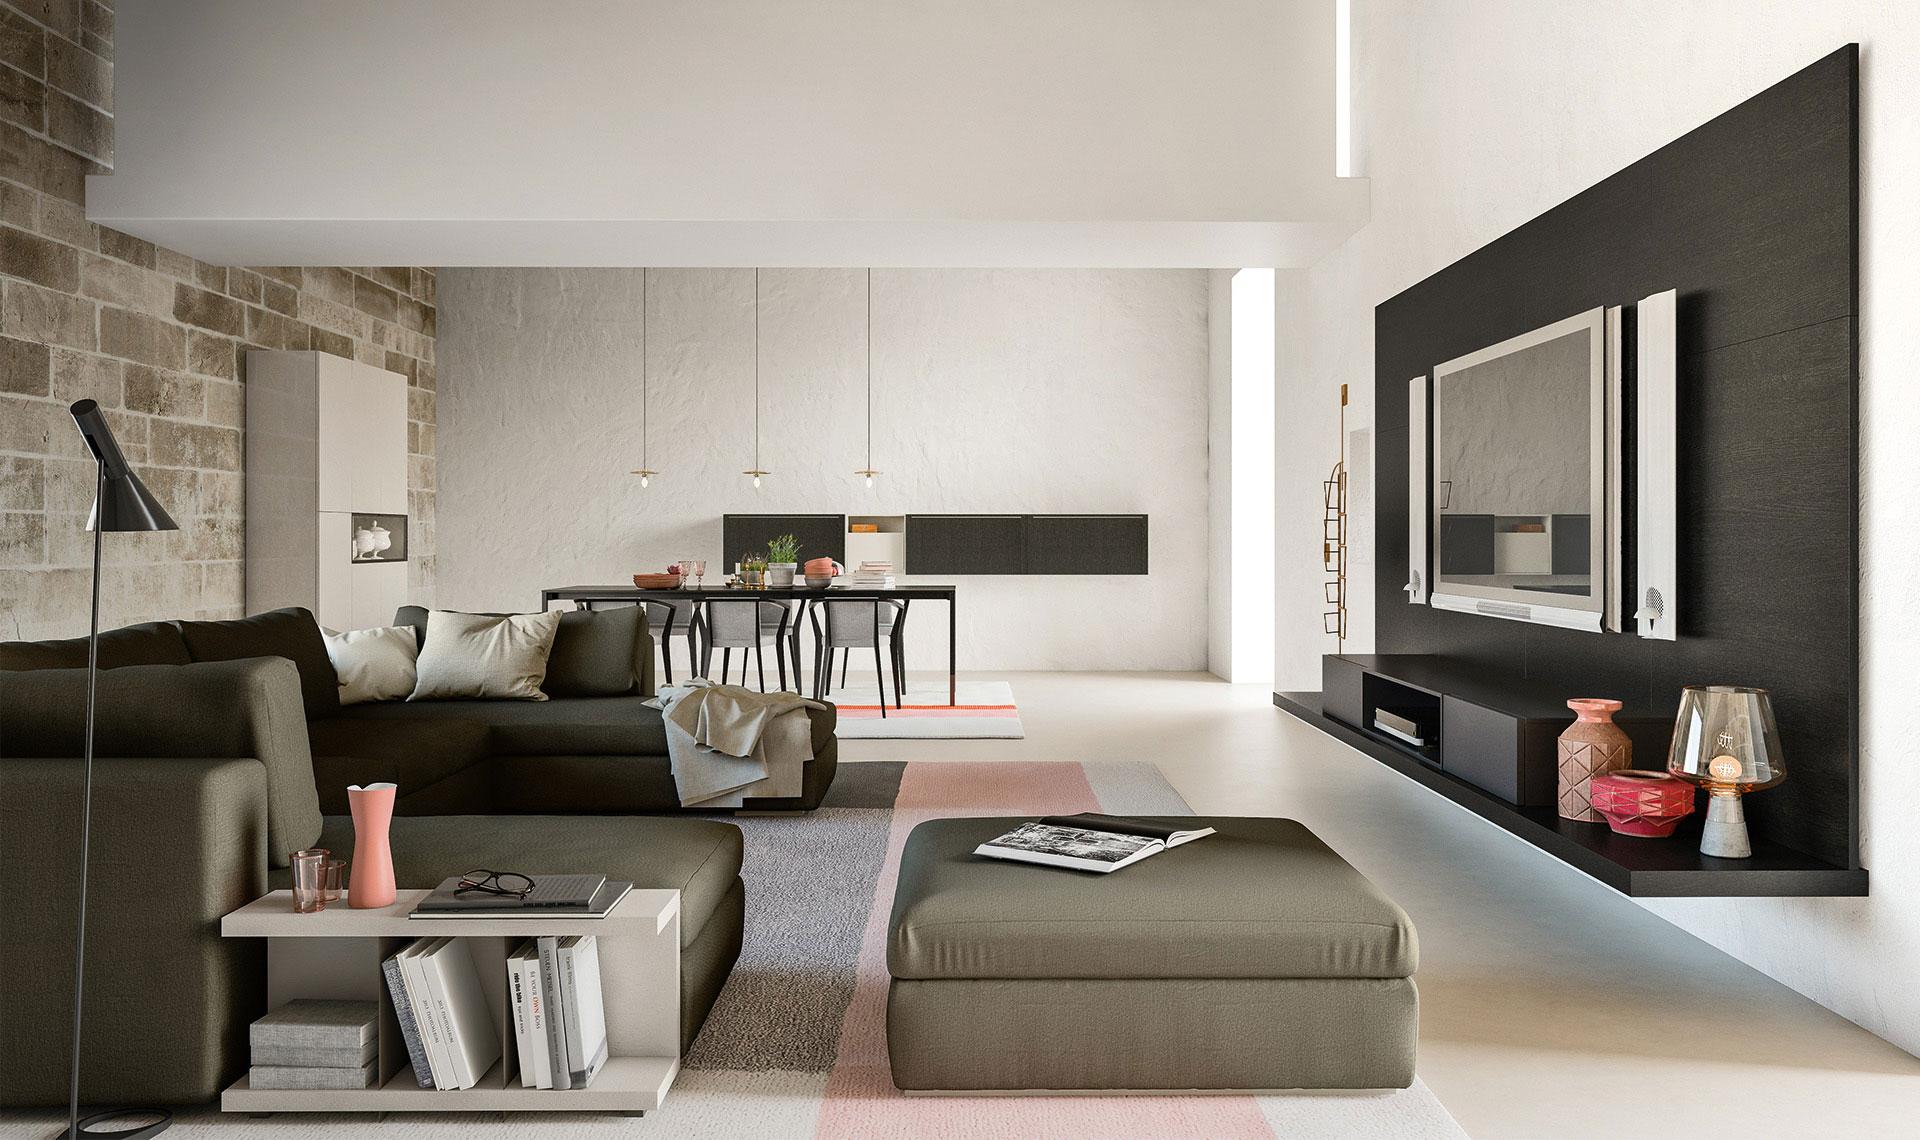 Arredare Casa Gratis Online design arredamento interni casa